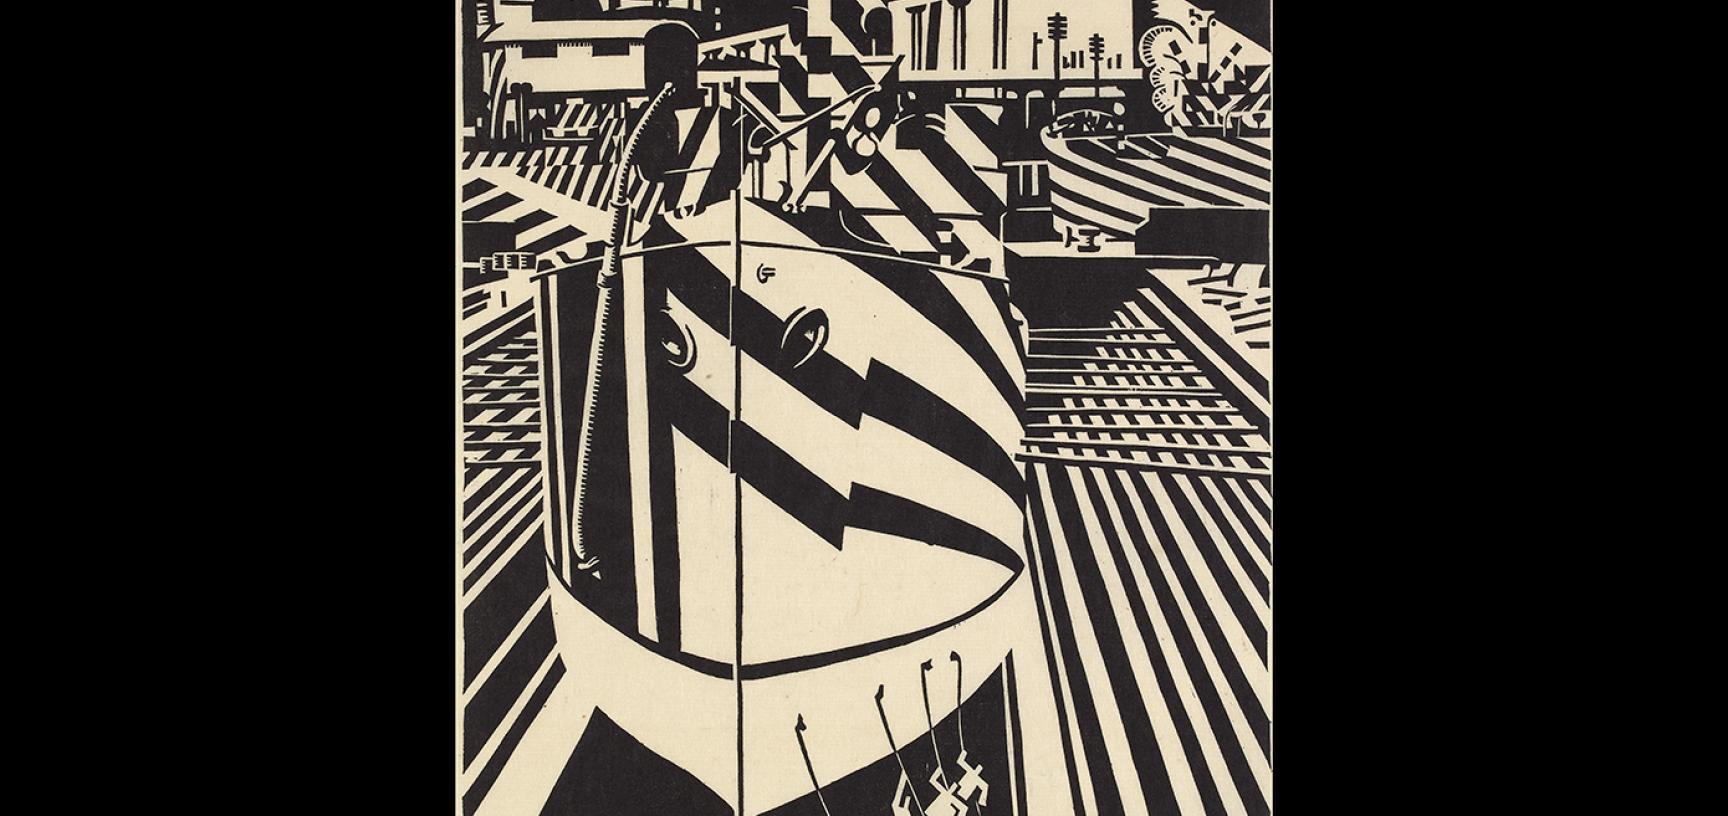 Edward Wadsworth, Liverpool Shipping, 1918 © Ashmolean Museum, Presented by Thomas Balston, WA1954.157.103